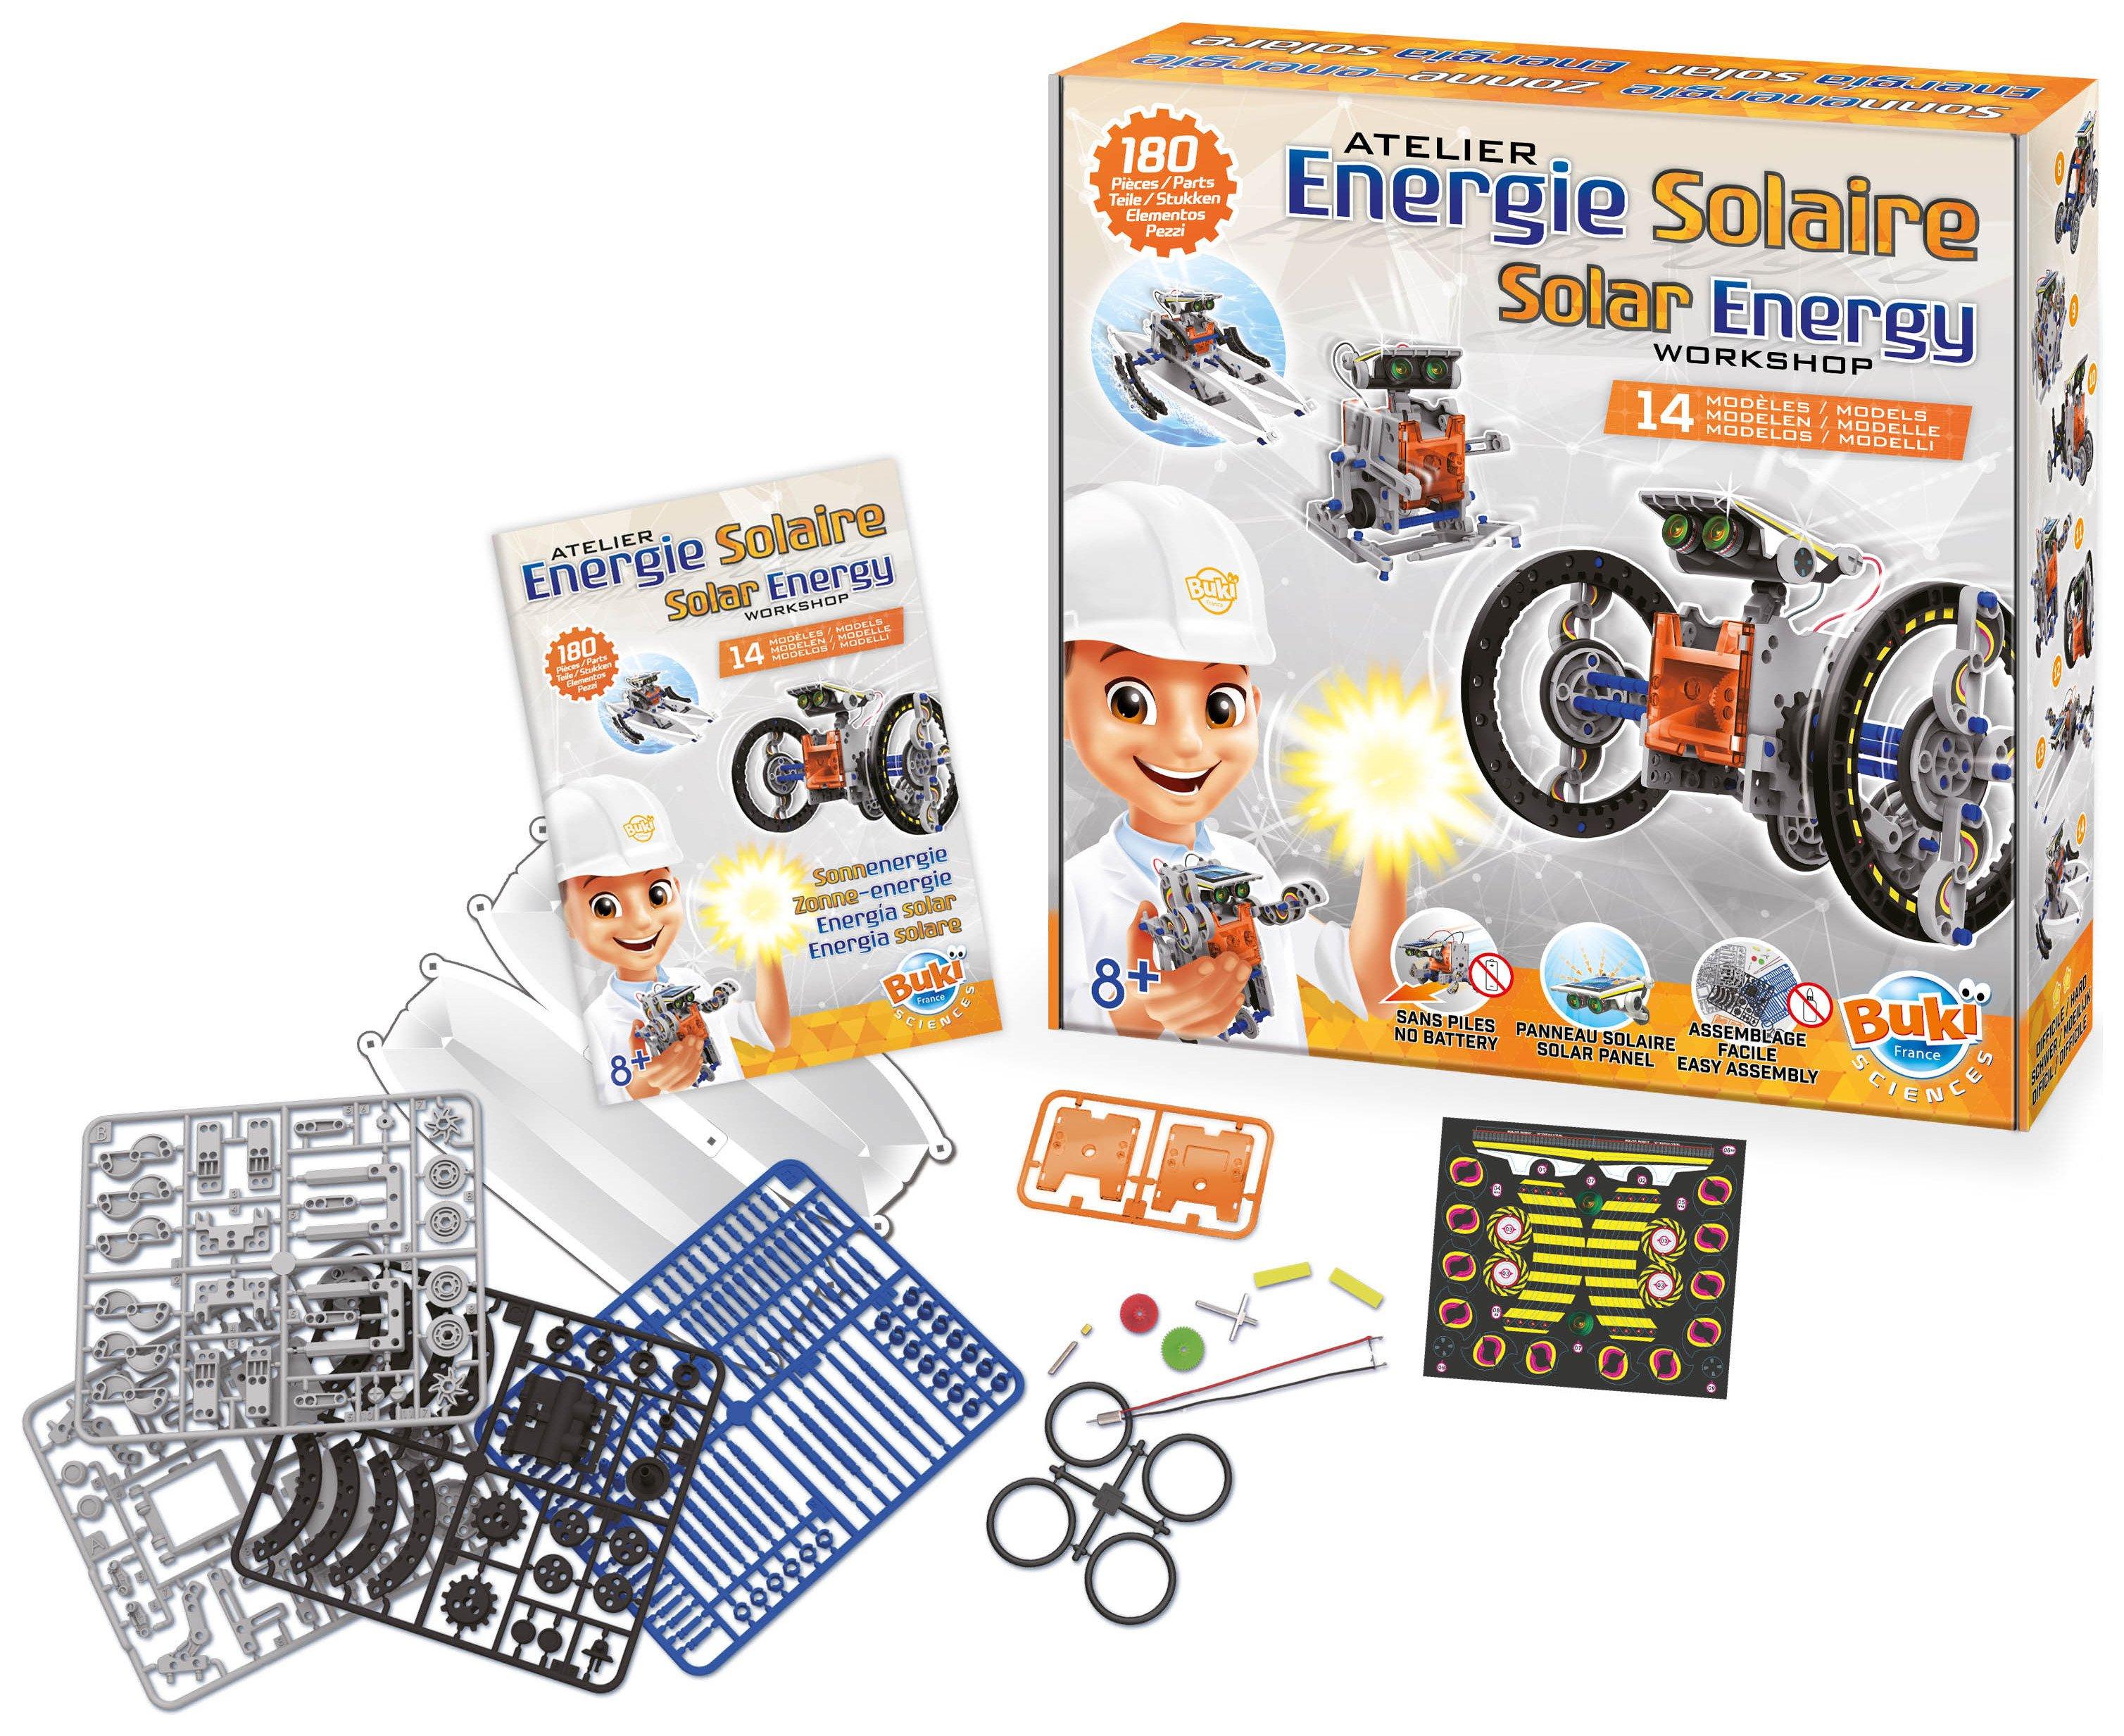 Image of Buki Solar Energy 14-in-1 Set.